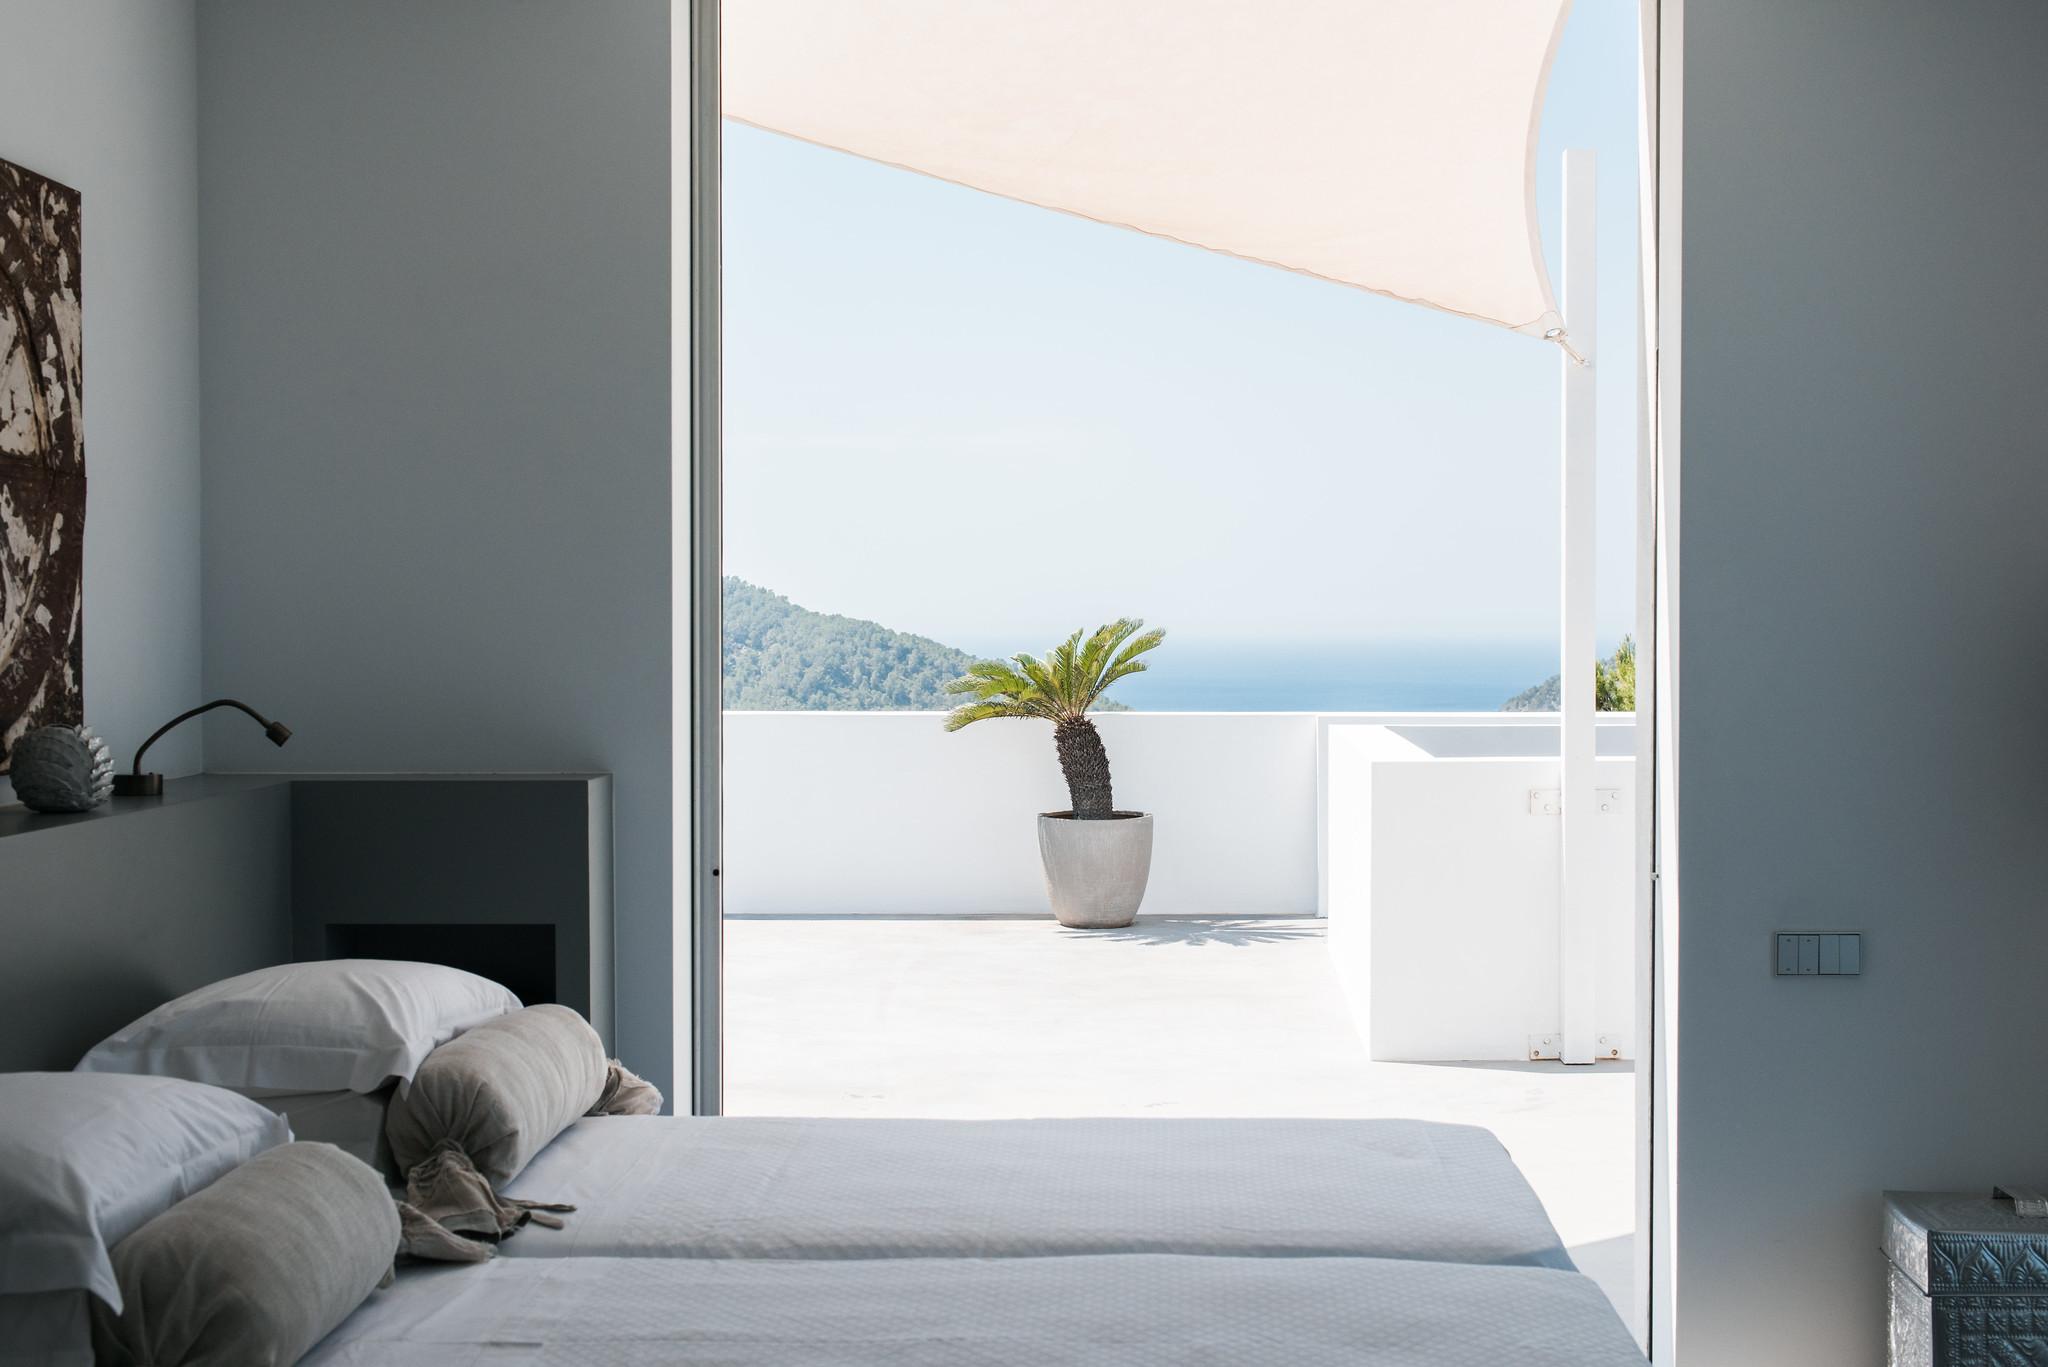 https://www.white-ibiza.com/wp-content/uploads/2020/05/white-ibiza-villas-can-zama-bedroom-two.jpg